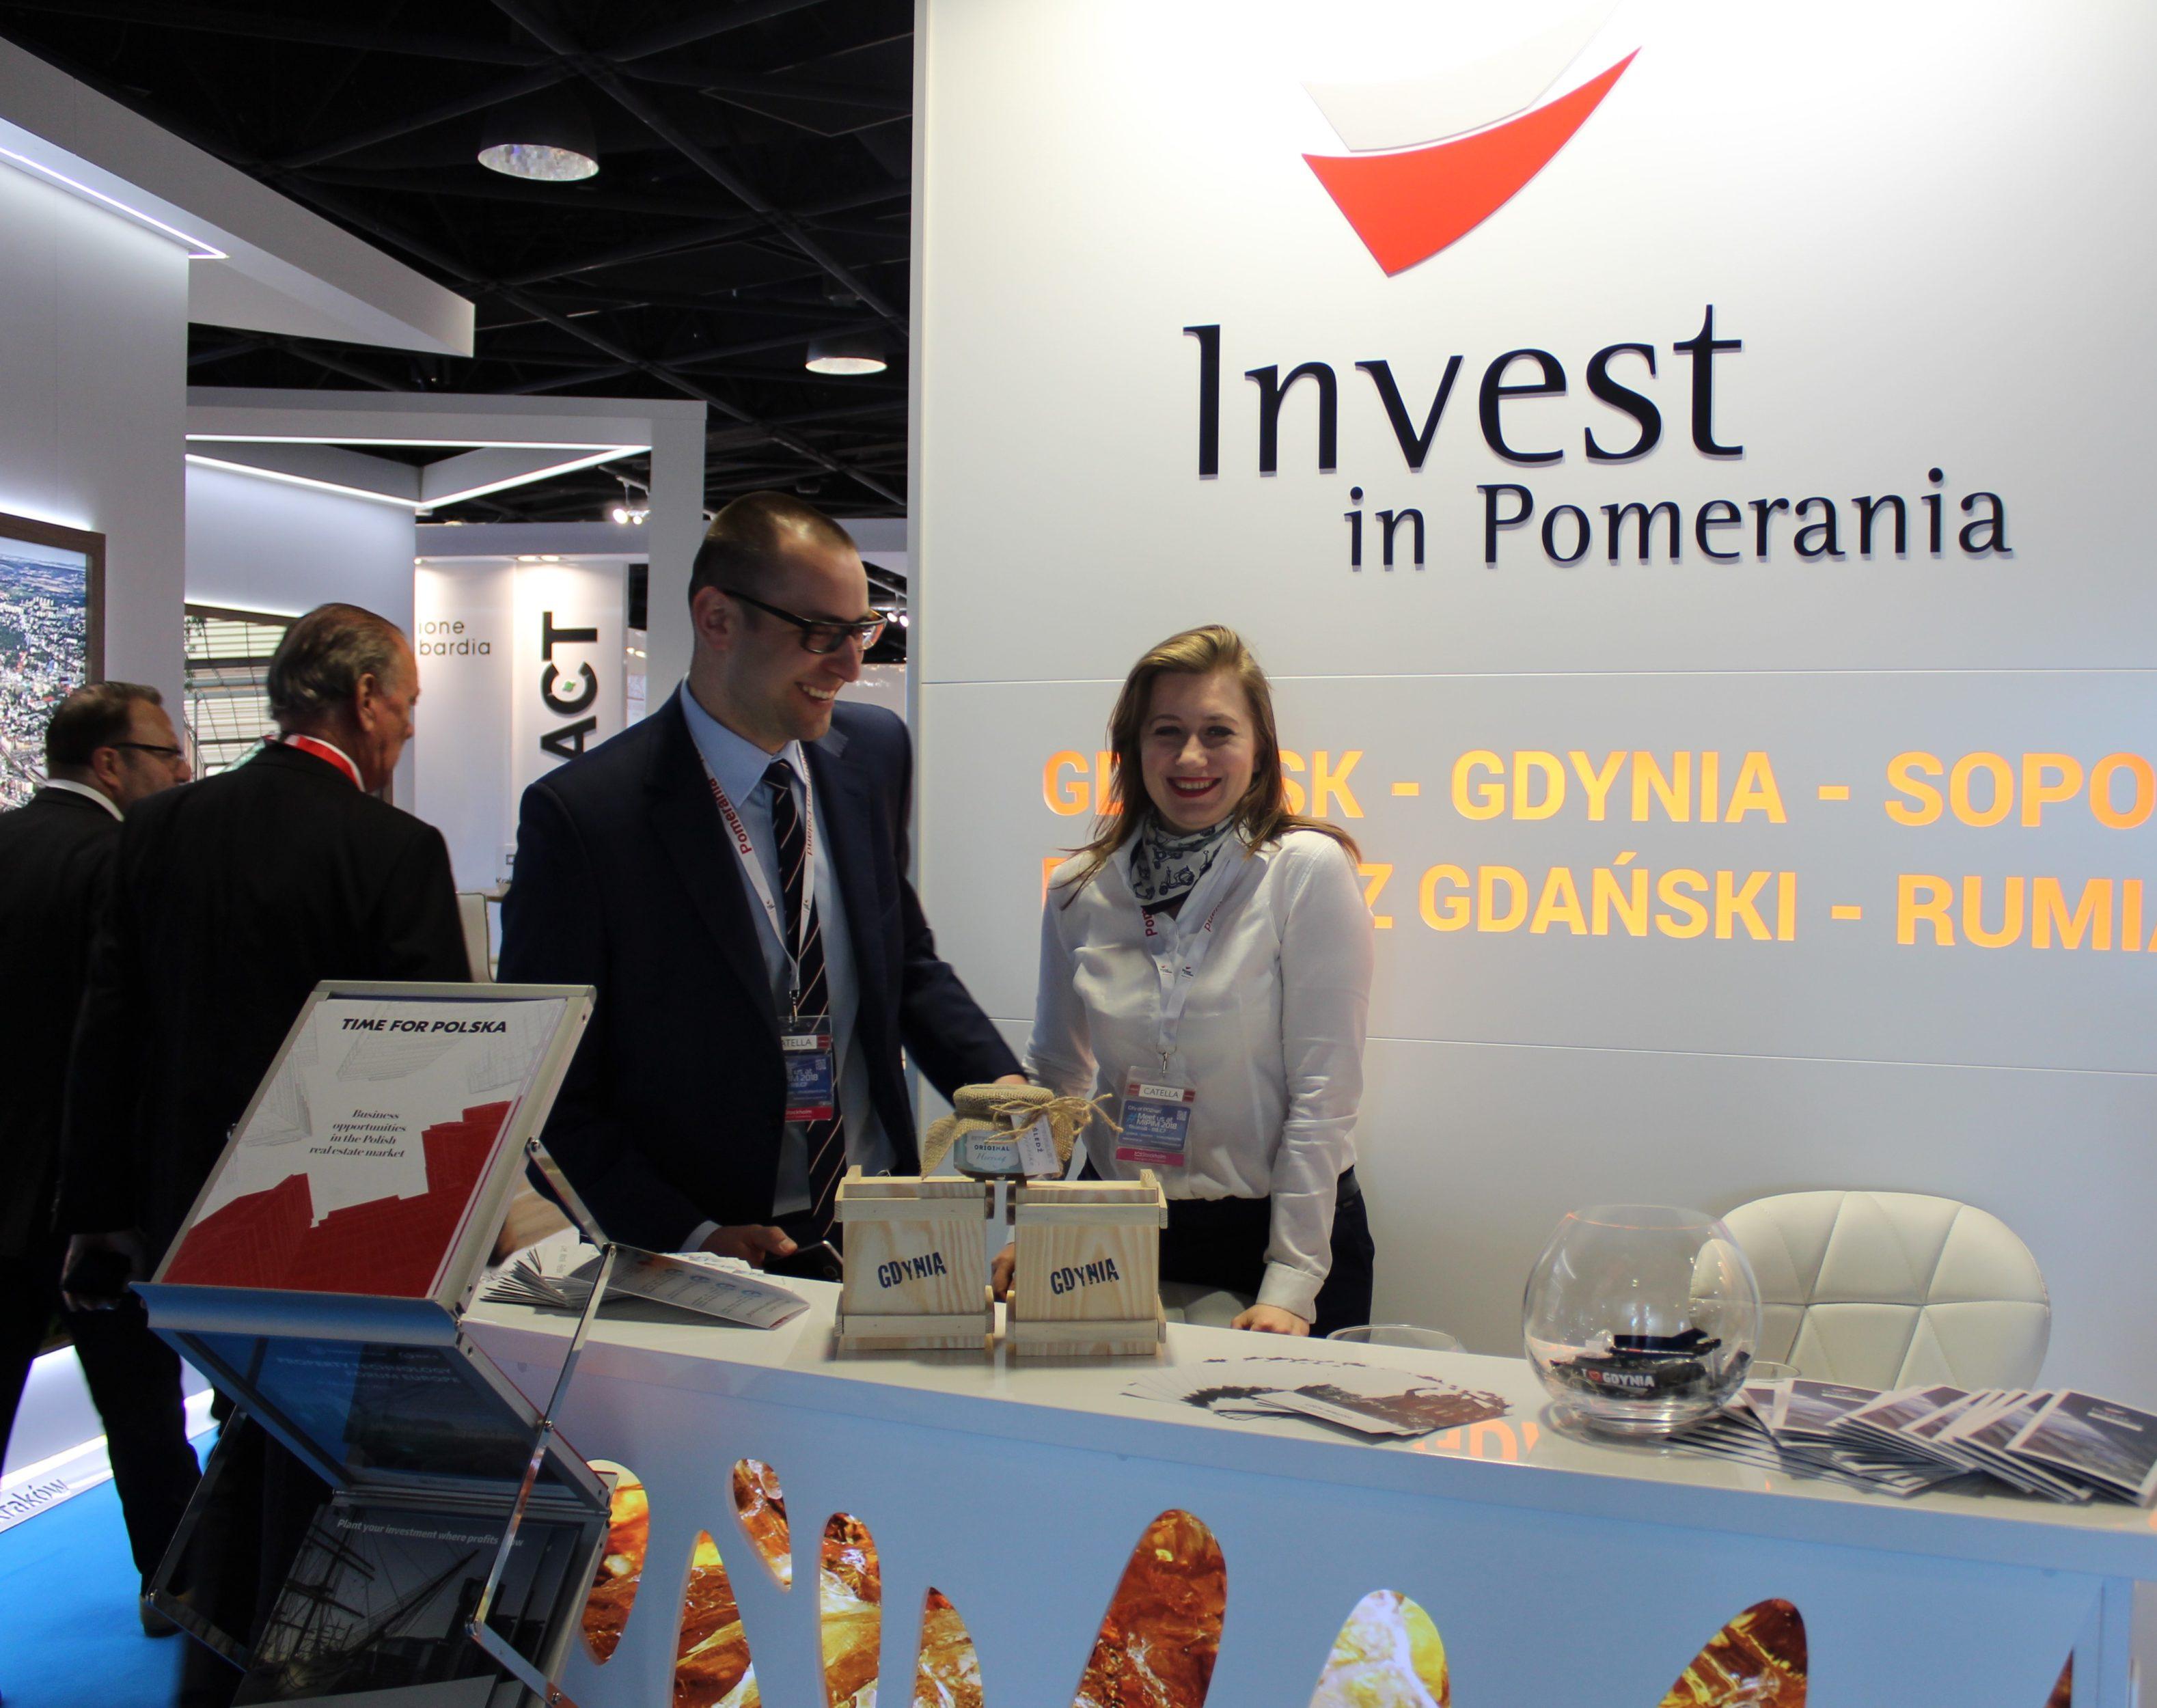 Invest in Pomerania at MIPIM 2018 in Cannes. Fot. materiały prasowe Invset in Pomerania